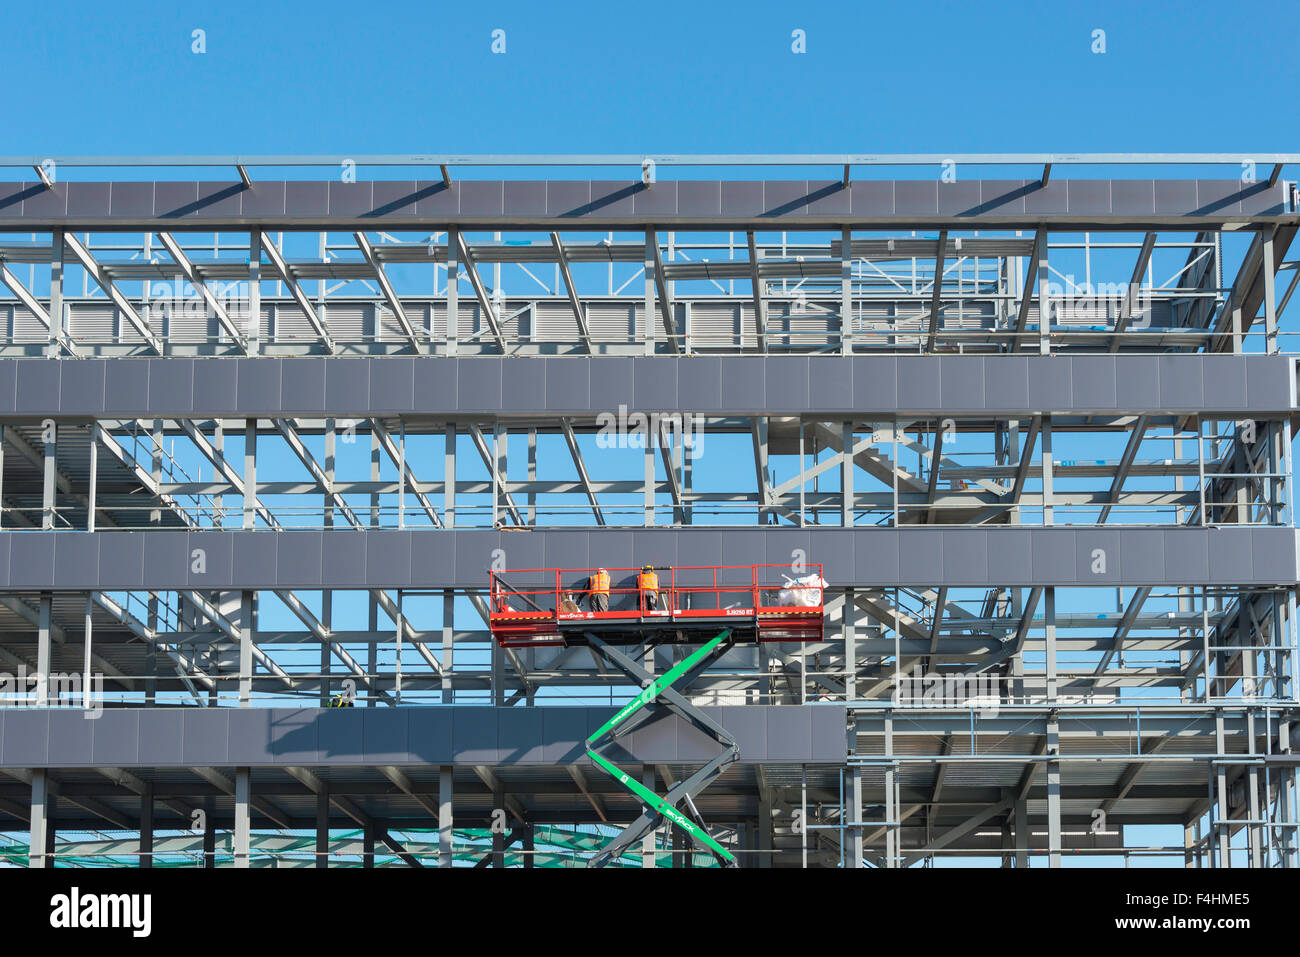 Scissor lift access platform on building site, Poyle, Berkshire, England, United Kingdom - Stock Image